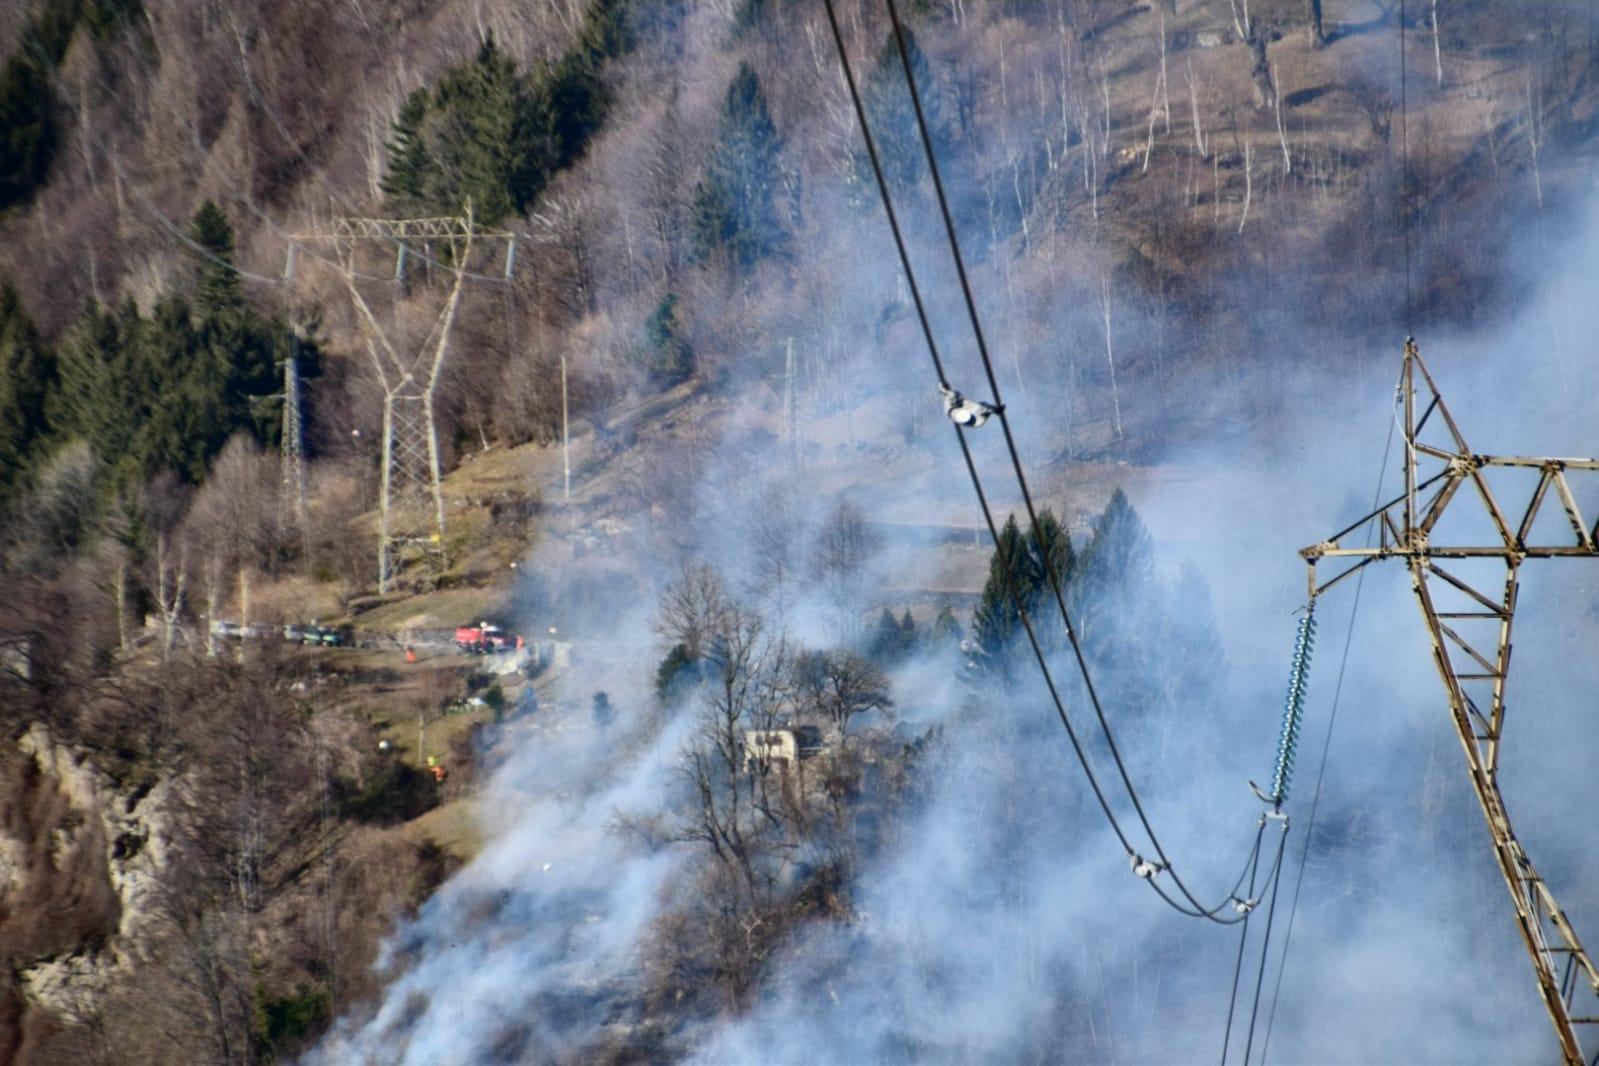 https://www.valsassinanews.com/wp-content/uploads/2020/02/Incendio-pagnona-feb20-QRV-2.jpeg